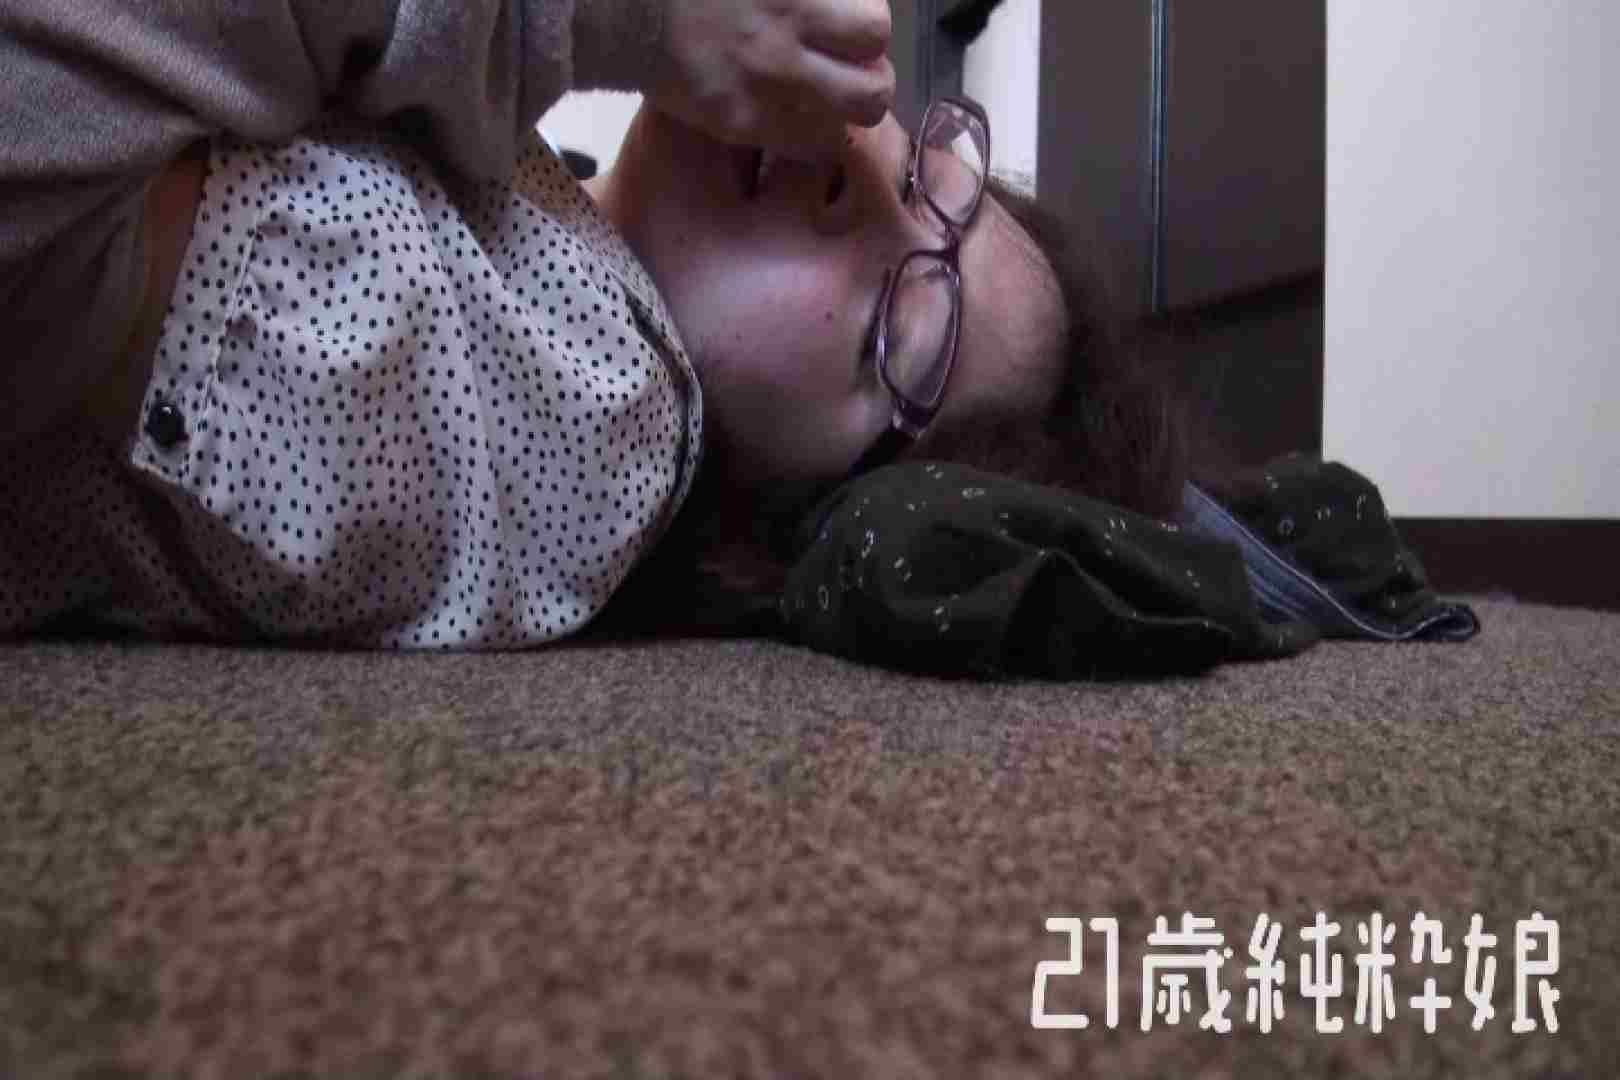 Gカップ21歳純粋嬢第2弾Vol.3 性欲 盗撮動画紹介 71pic 56